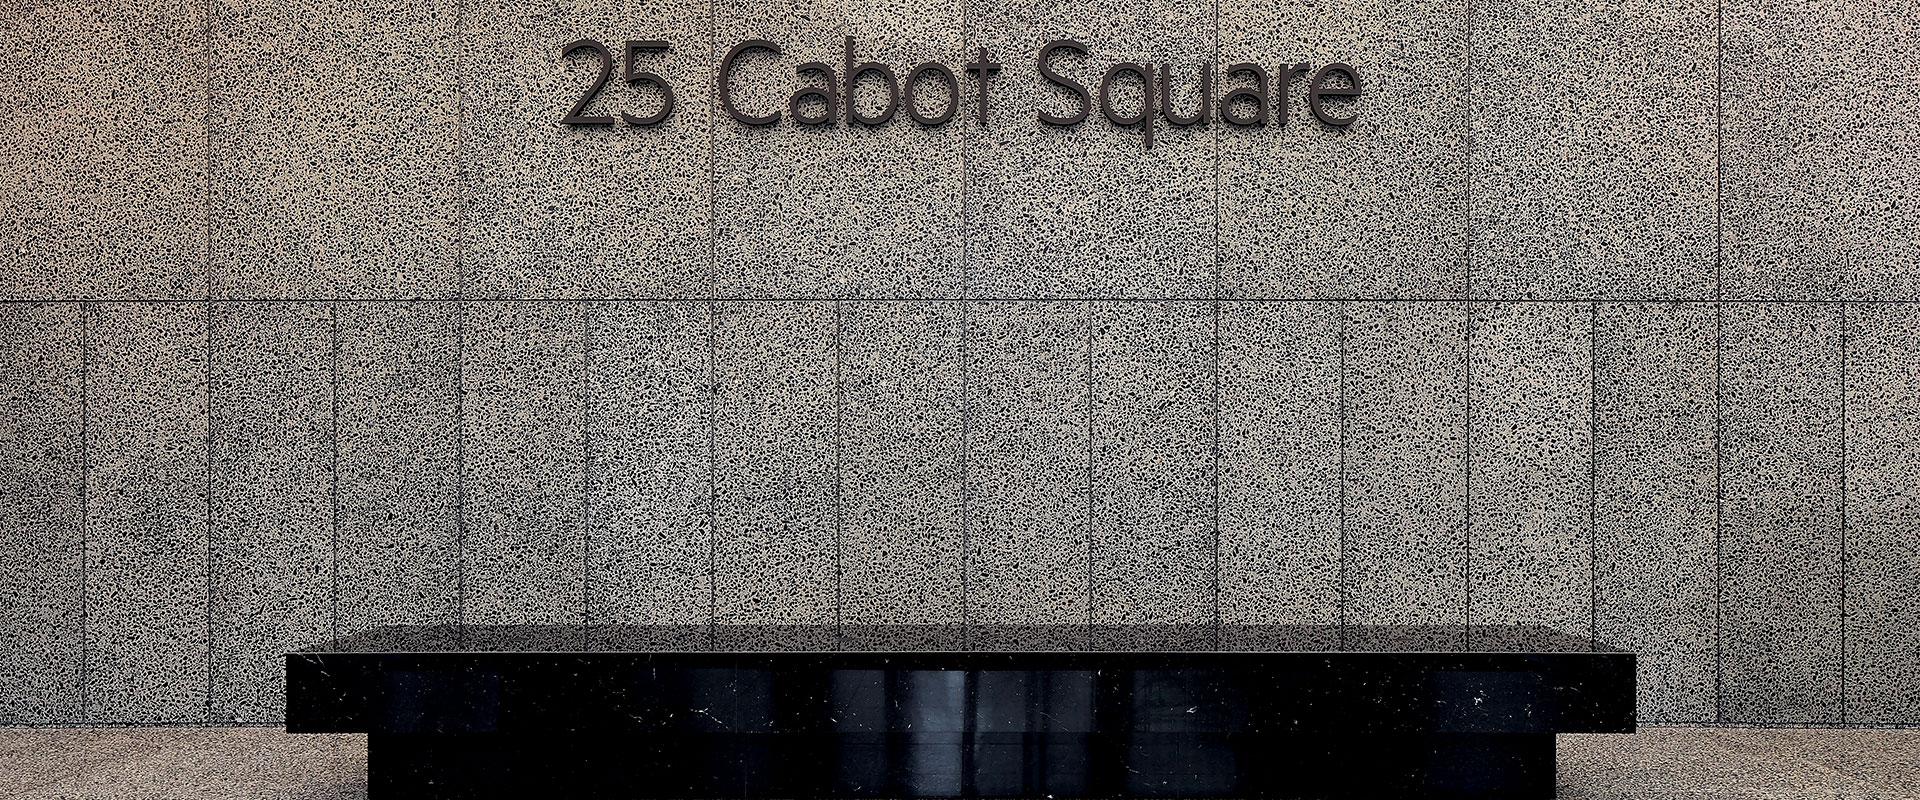 cabot-square---london-nited-kingdom---SB-260---centri-direzionali-01---OK